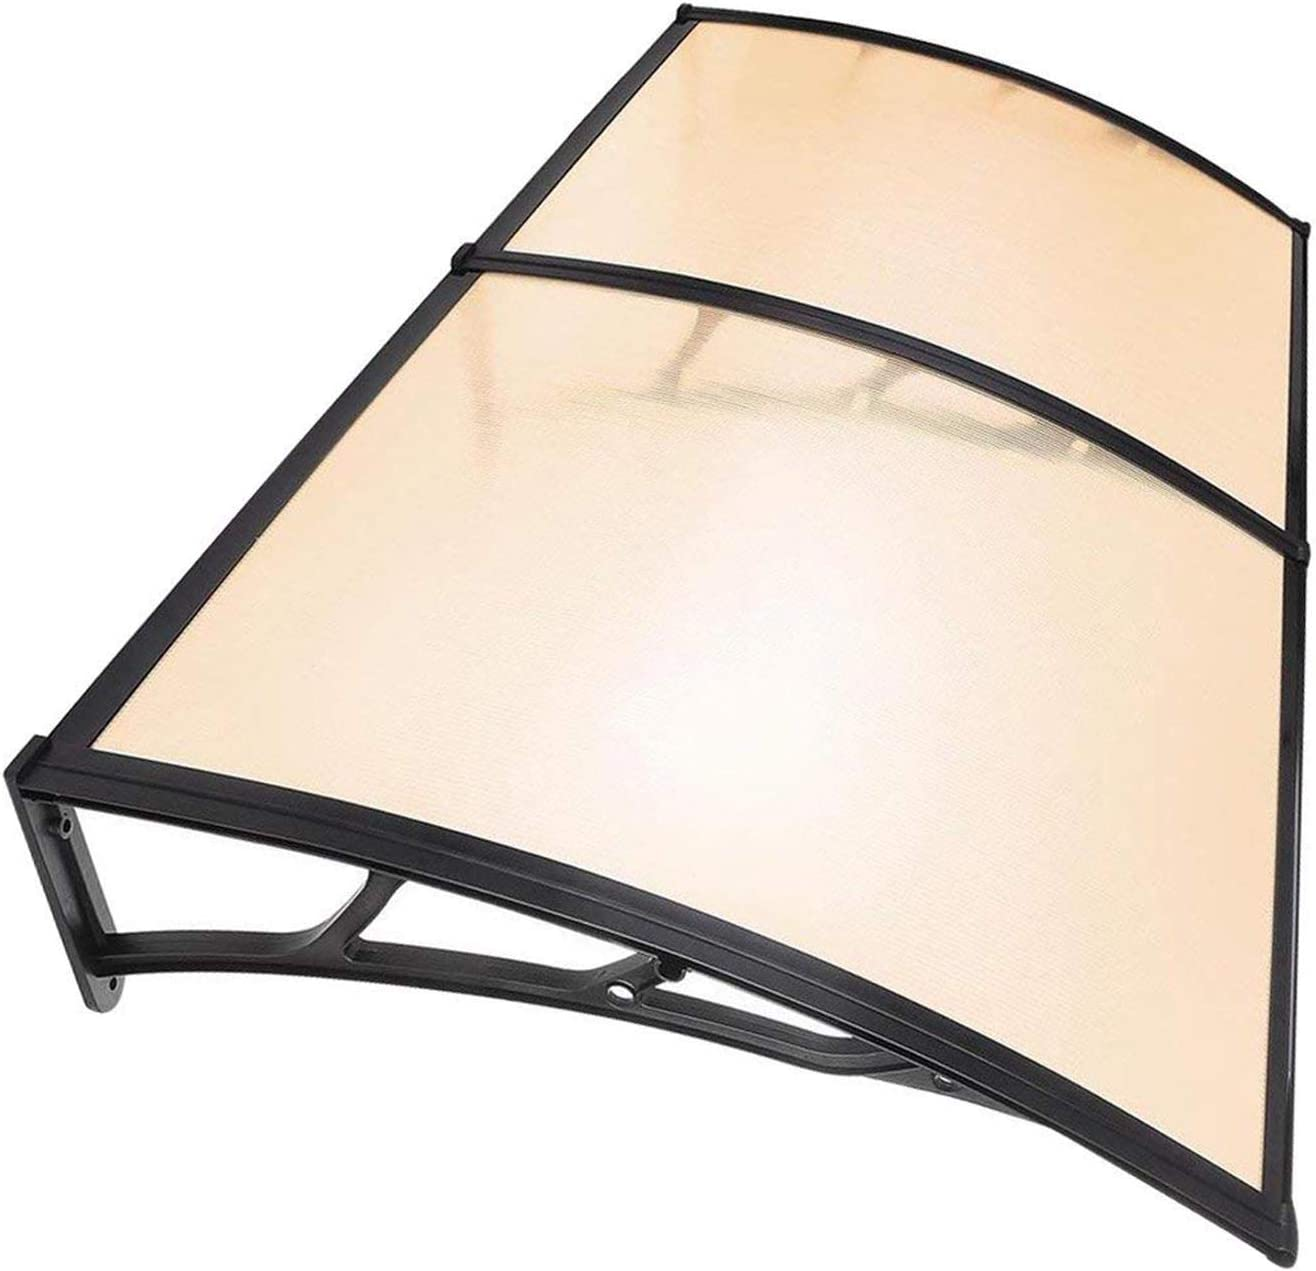 6.5 FT, Coffee Koval Inc 6.5 ft DIY Overhead Clear Outdoor Awning Patio Cover Door Window Polycarbonate Modern Design UV Rain Sunshine